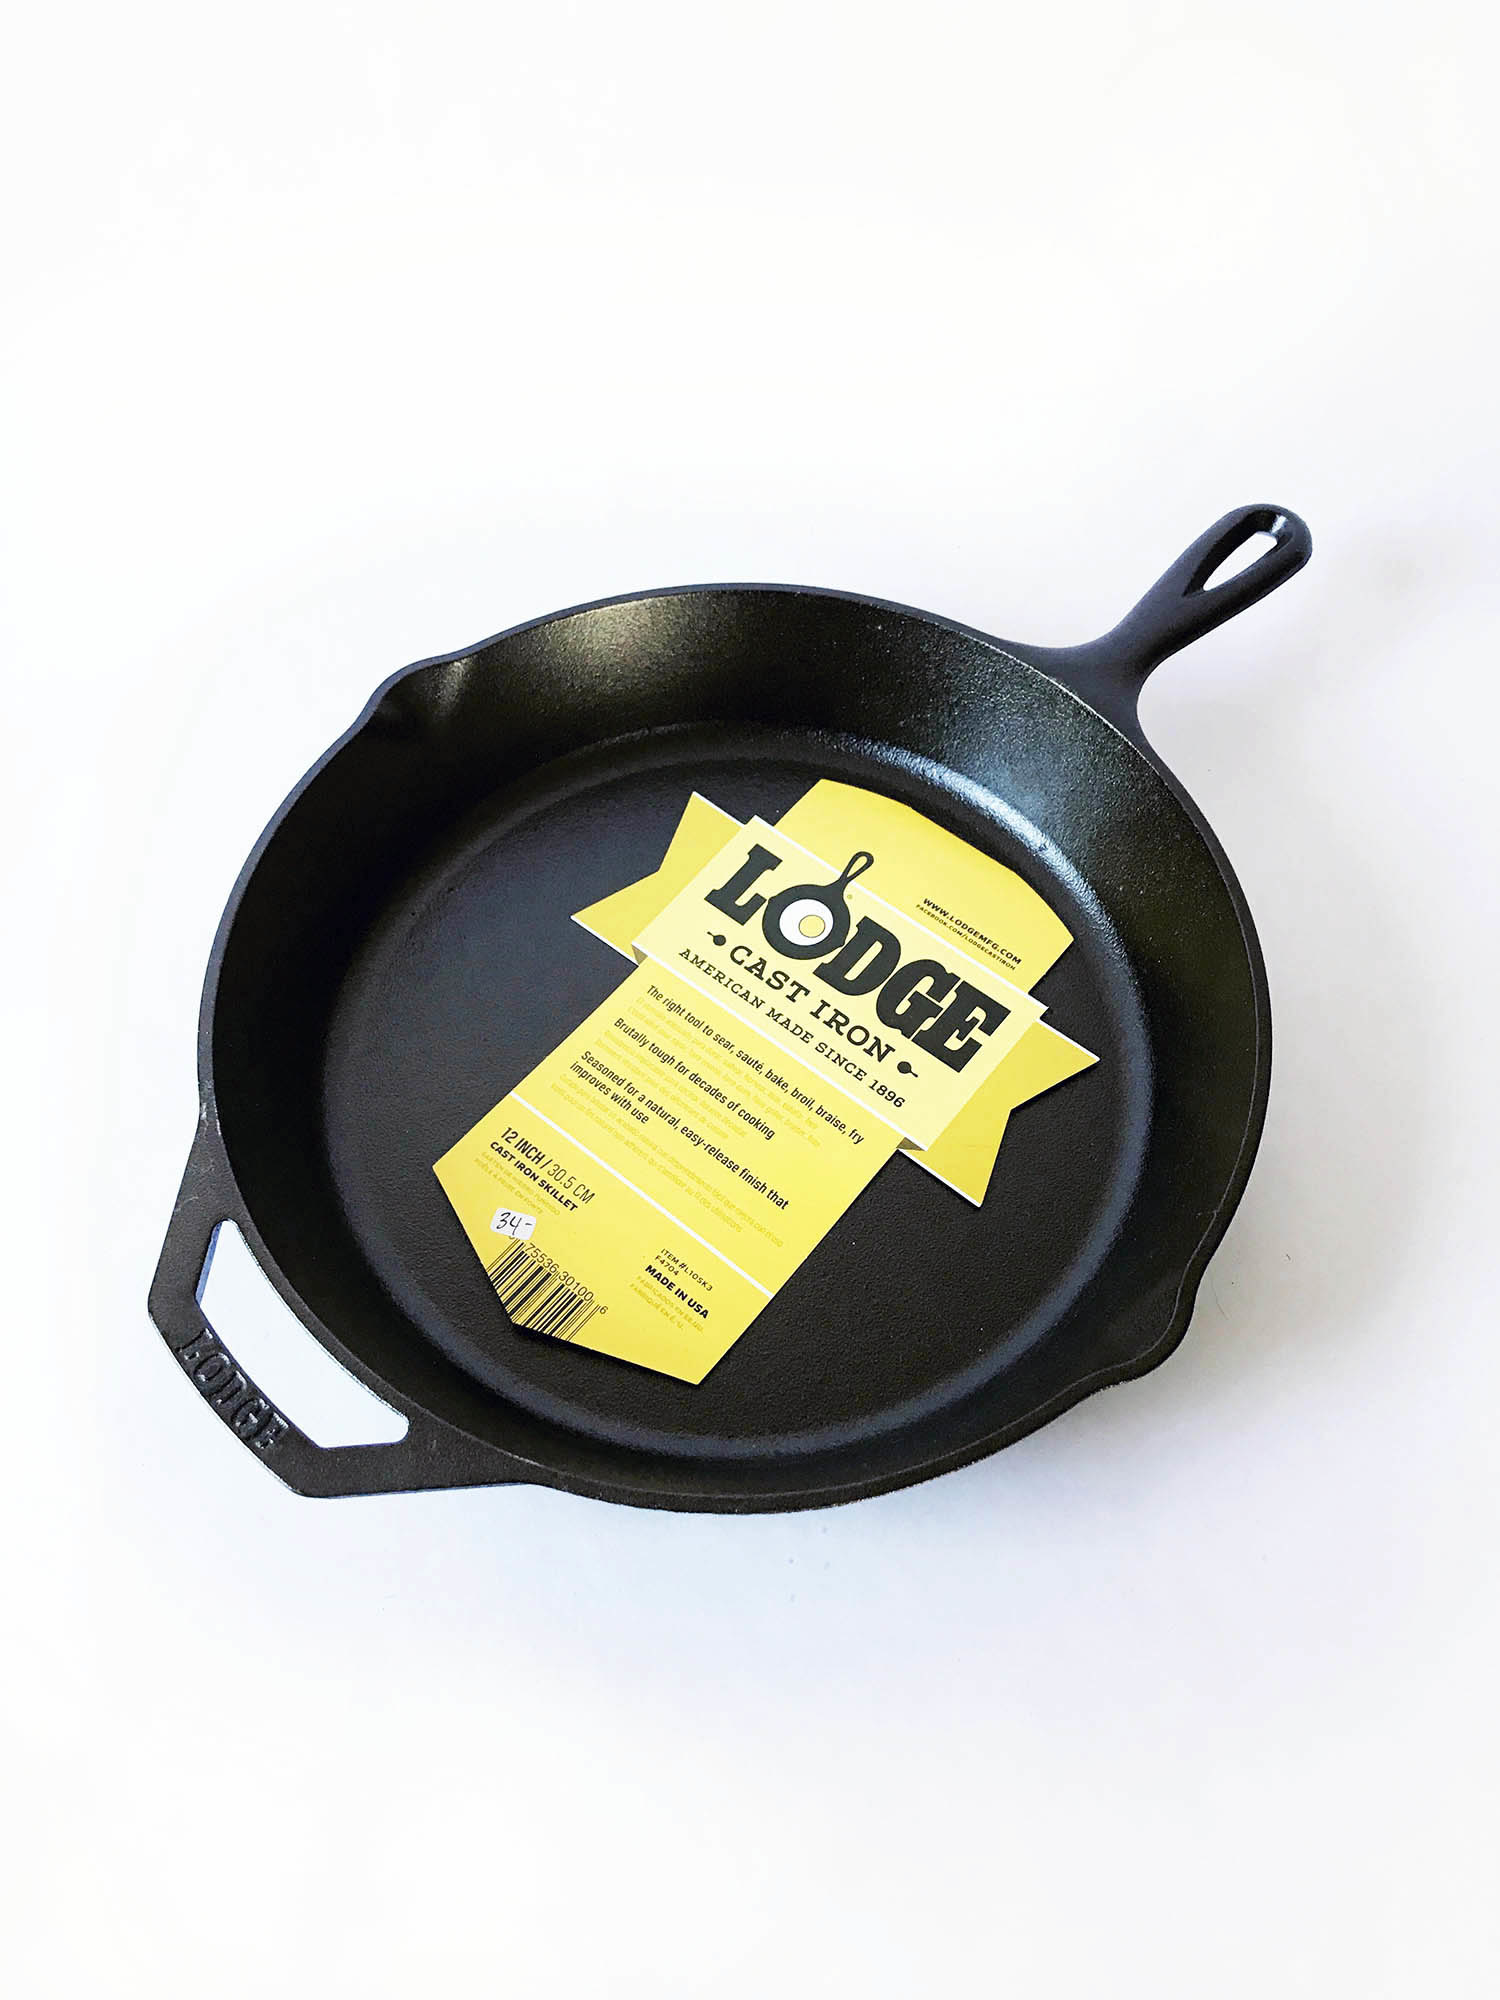 Lodge Cast Iron Skillets-1